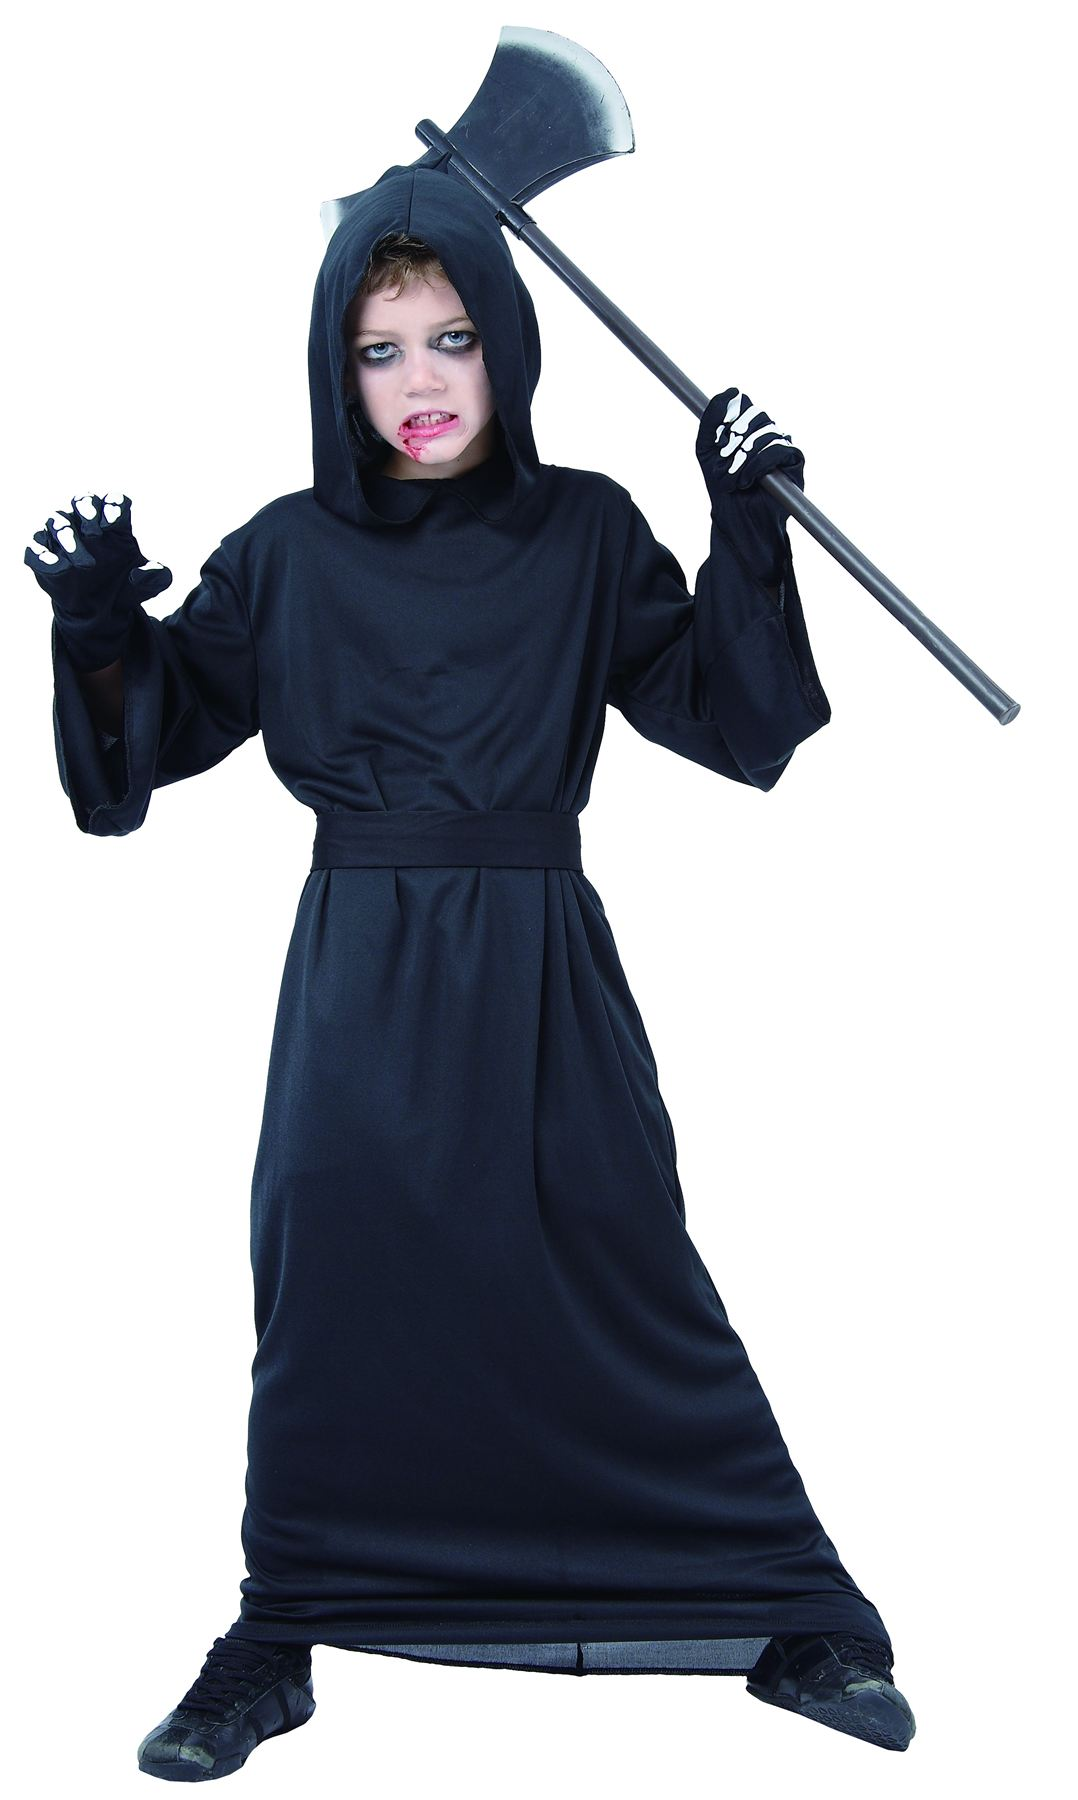 KIDS HALLOWEEN FANCY COSTUME HORROR DRESS SKELETON VAMPIRESS WITCH ...